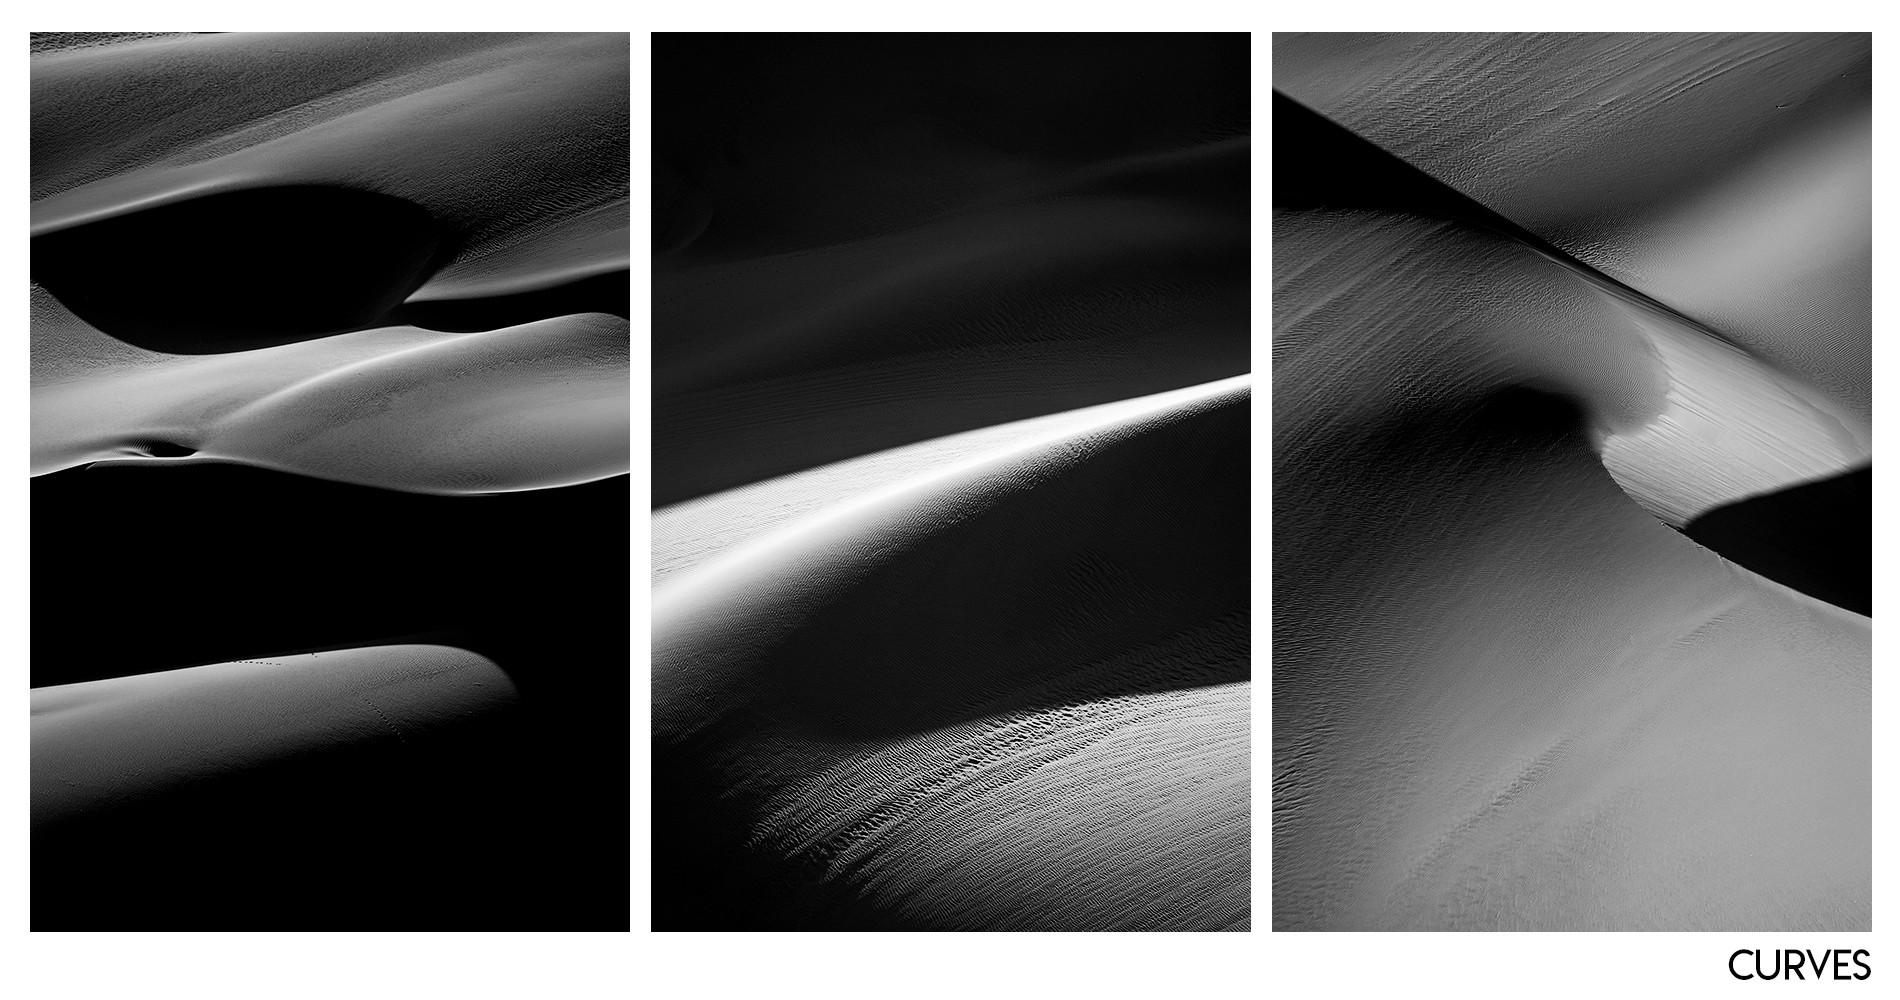 curves.jpg